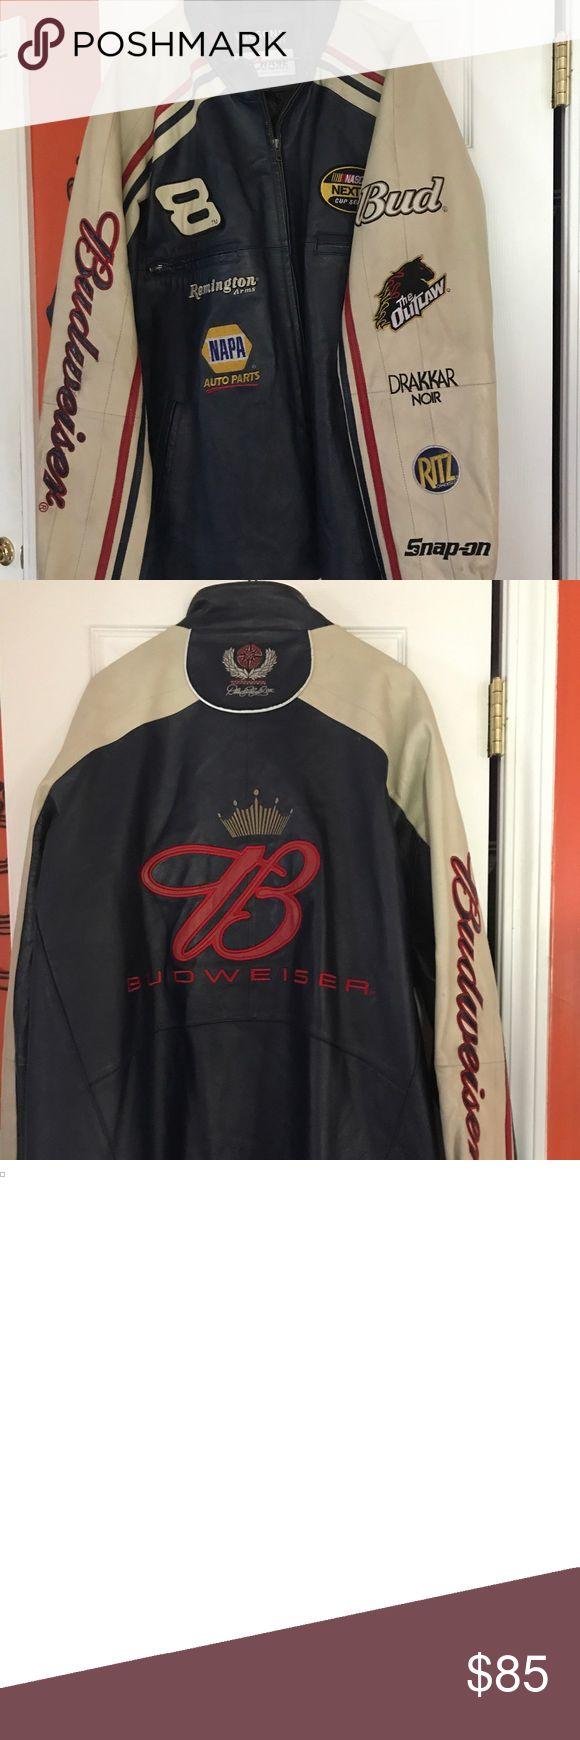 Wilson's Leather Dale Earnhardt NASCAR Jacket Me…